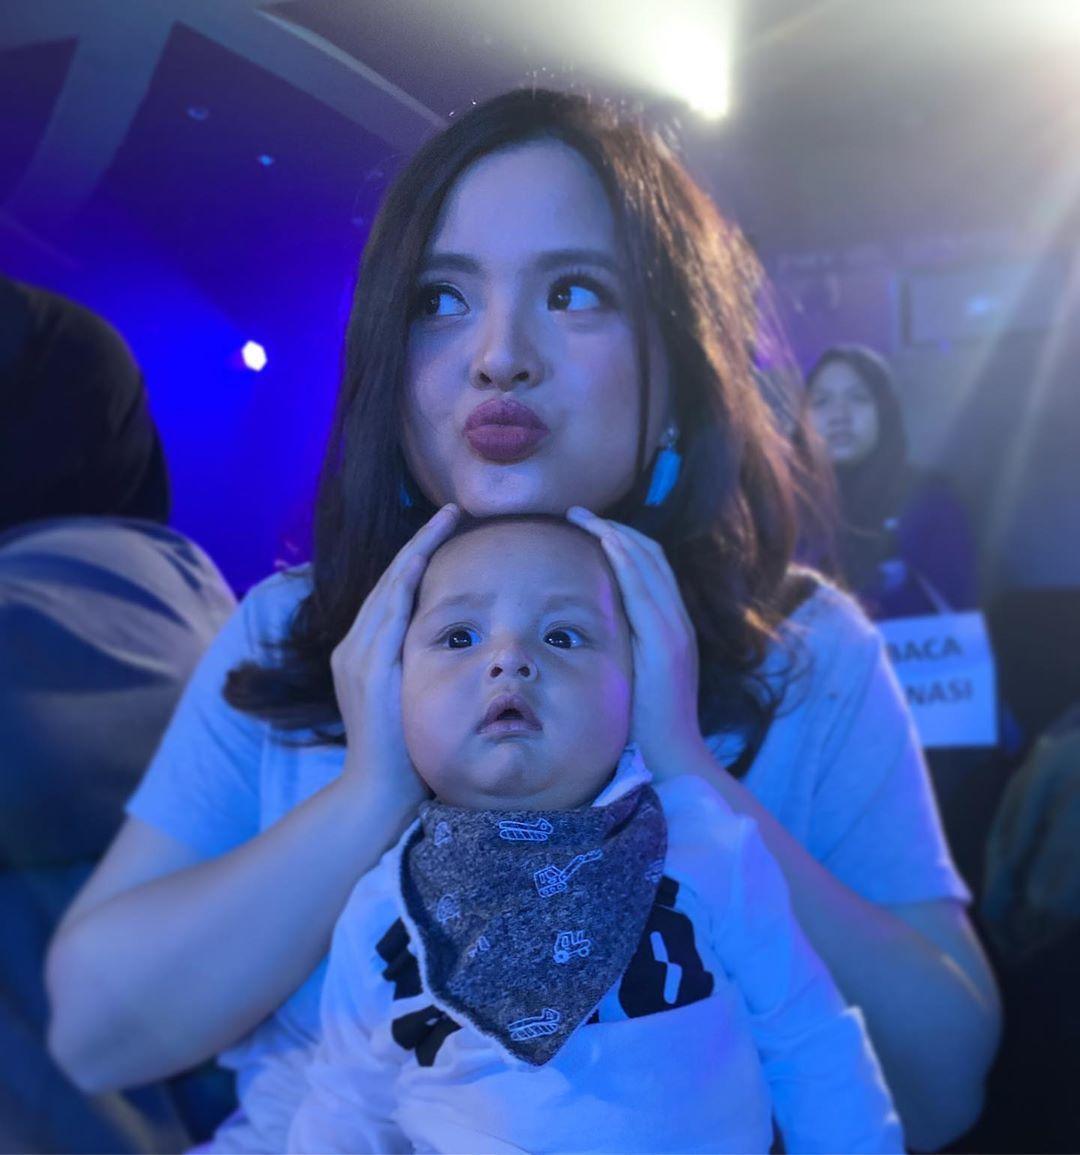 Family Goals! Intip 7 Potret Manisnya Keluarga Tasya Kamila